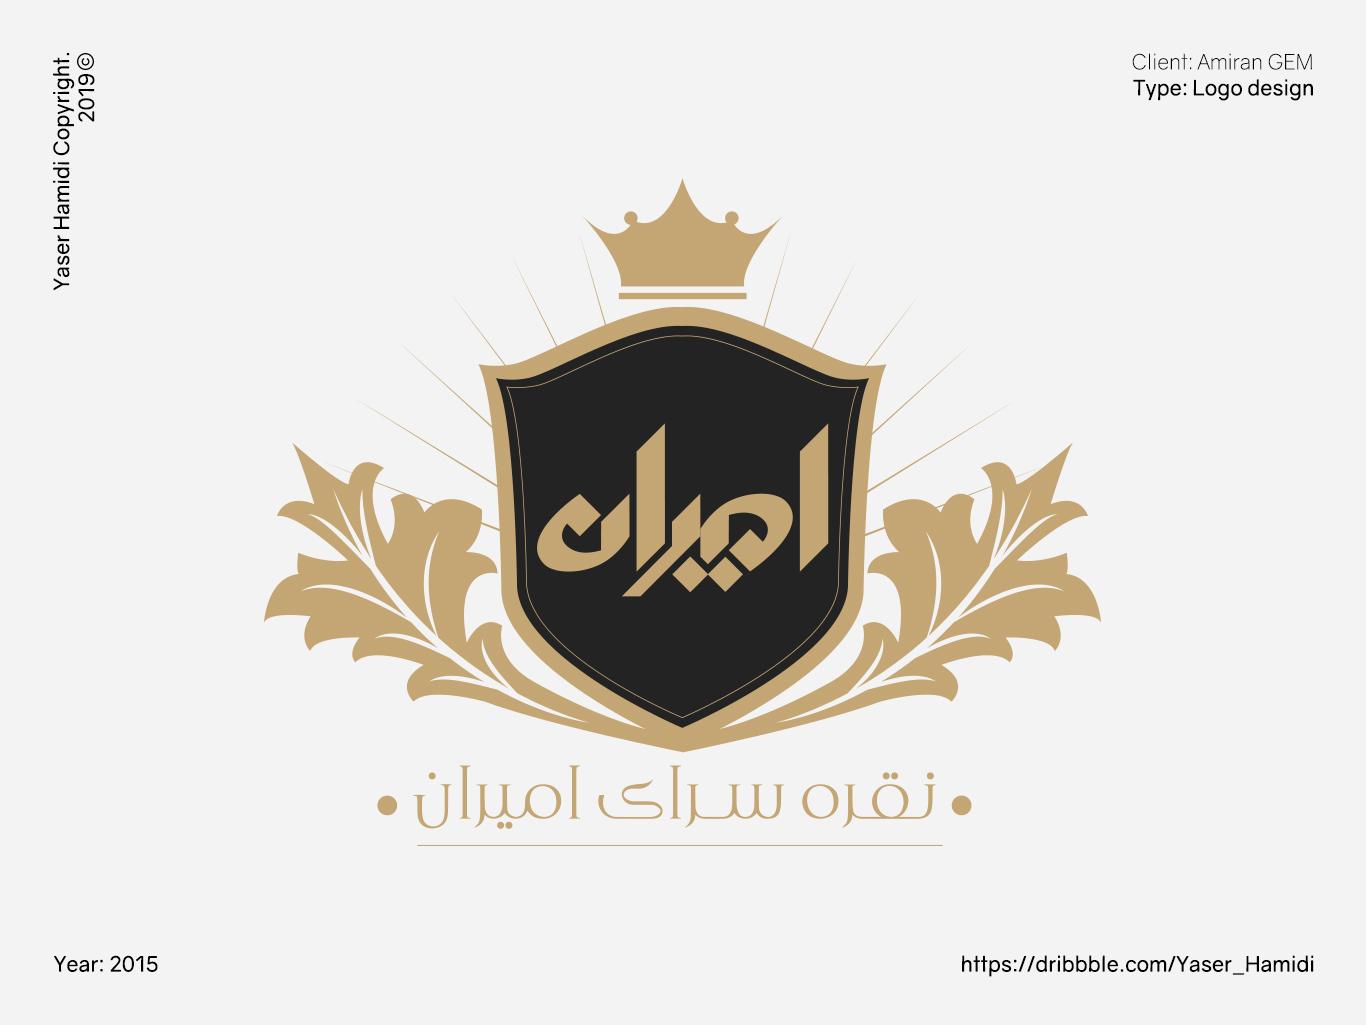 Amiran GEM | نقره سرای امیران typography branding symbol logotype logotipo logodesign logo illustrator illustration icon brand design vector design logoinspiration